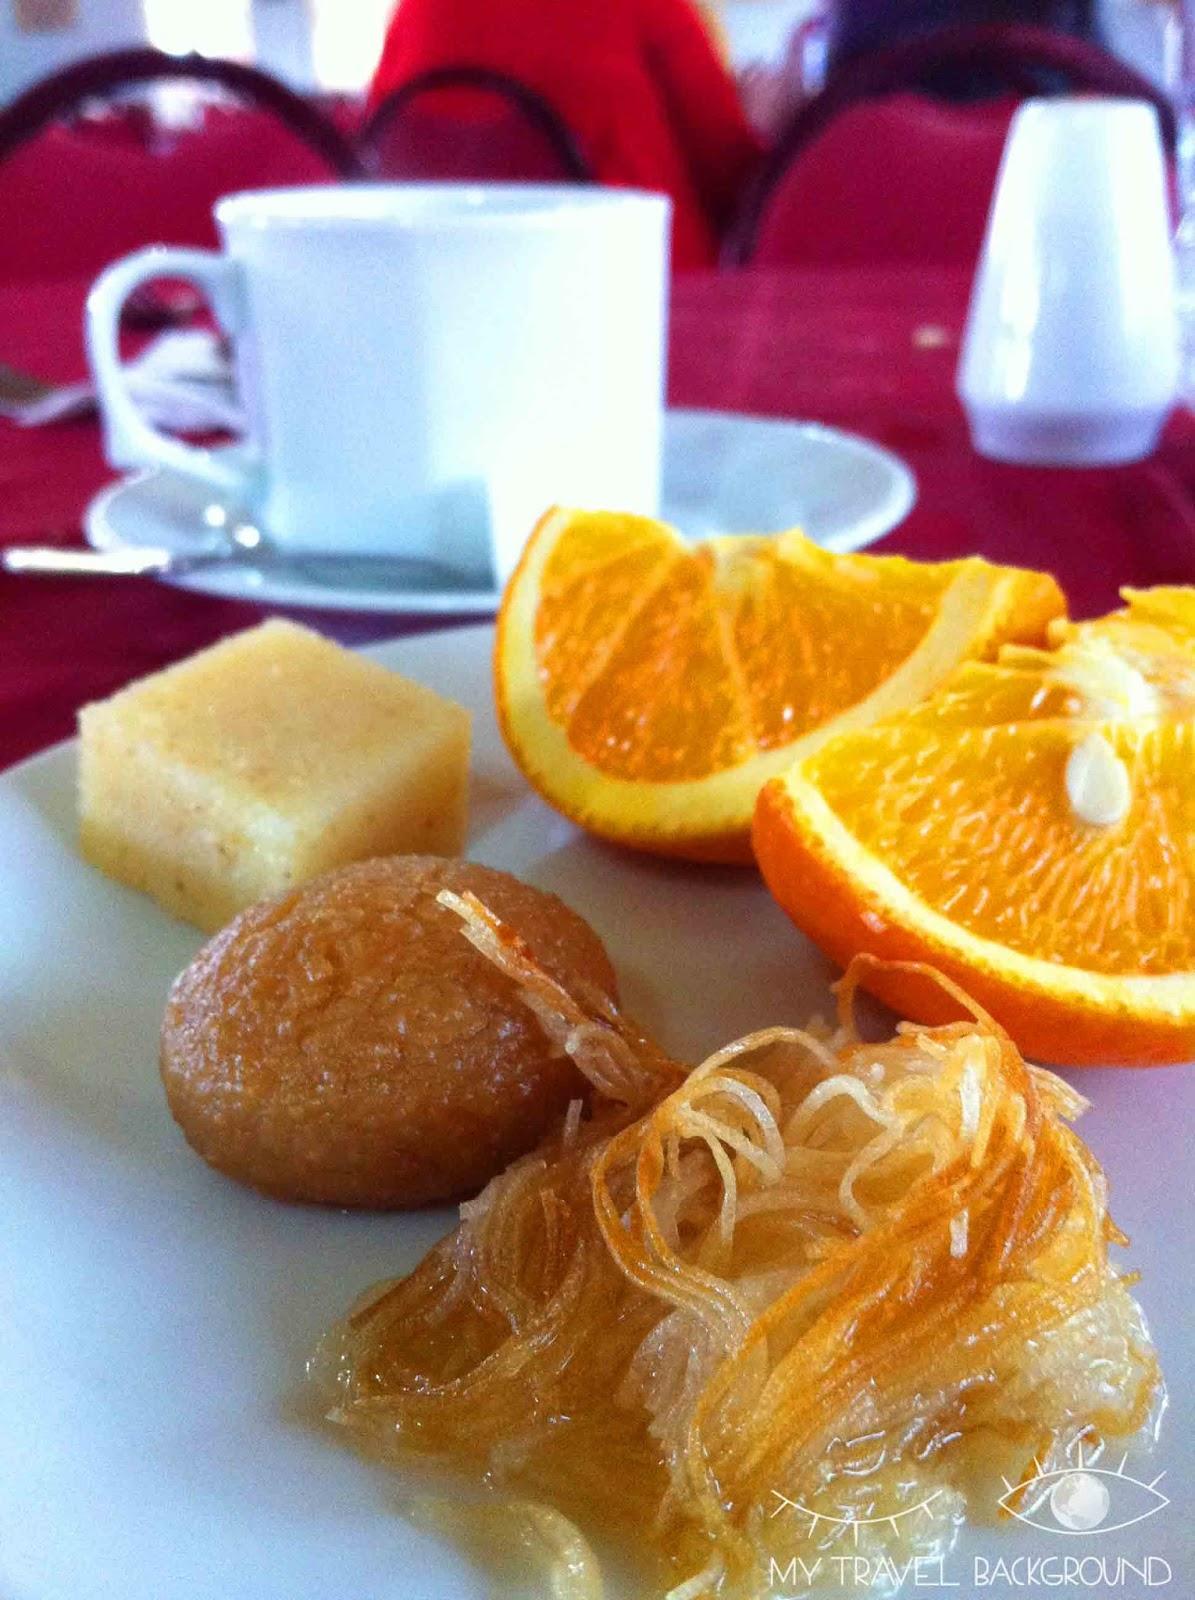 My Travel Background : 14 plats typiques dégustés en voyage - Desserts orientaux en Turquie, Antalya